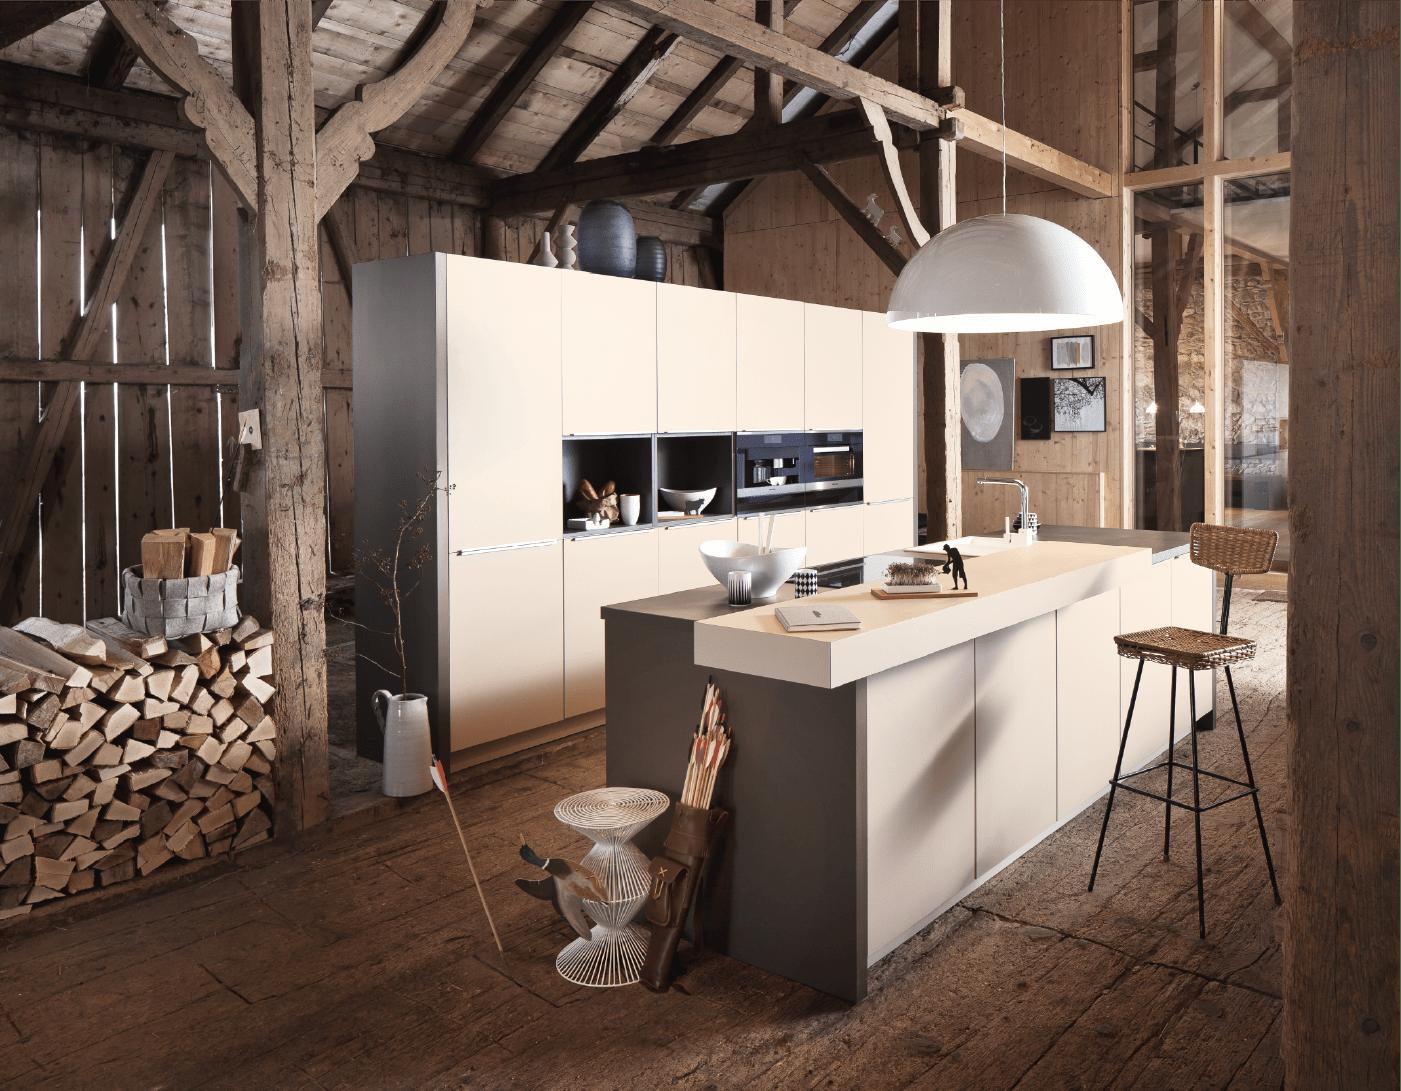 Cabeo-keukens-1-keuken-foto-3